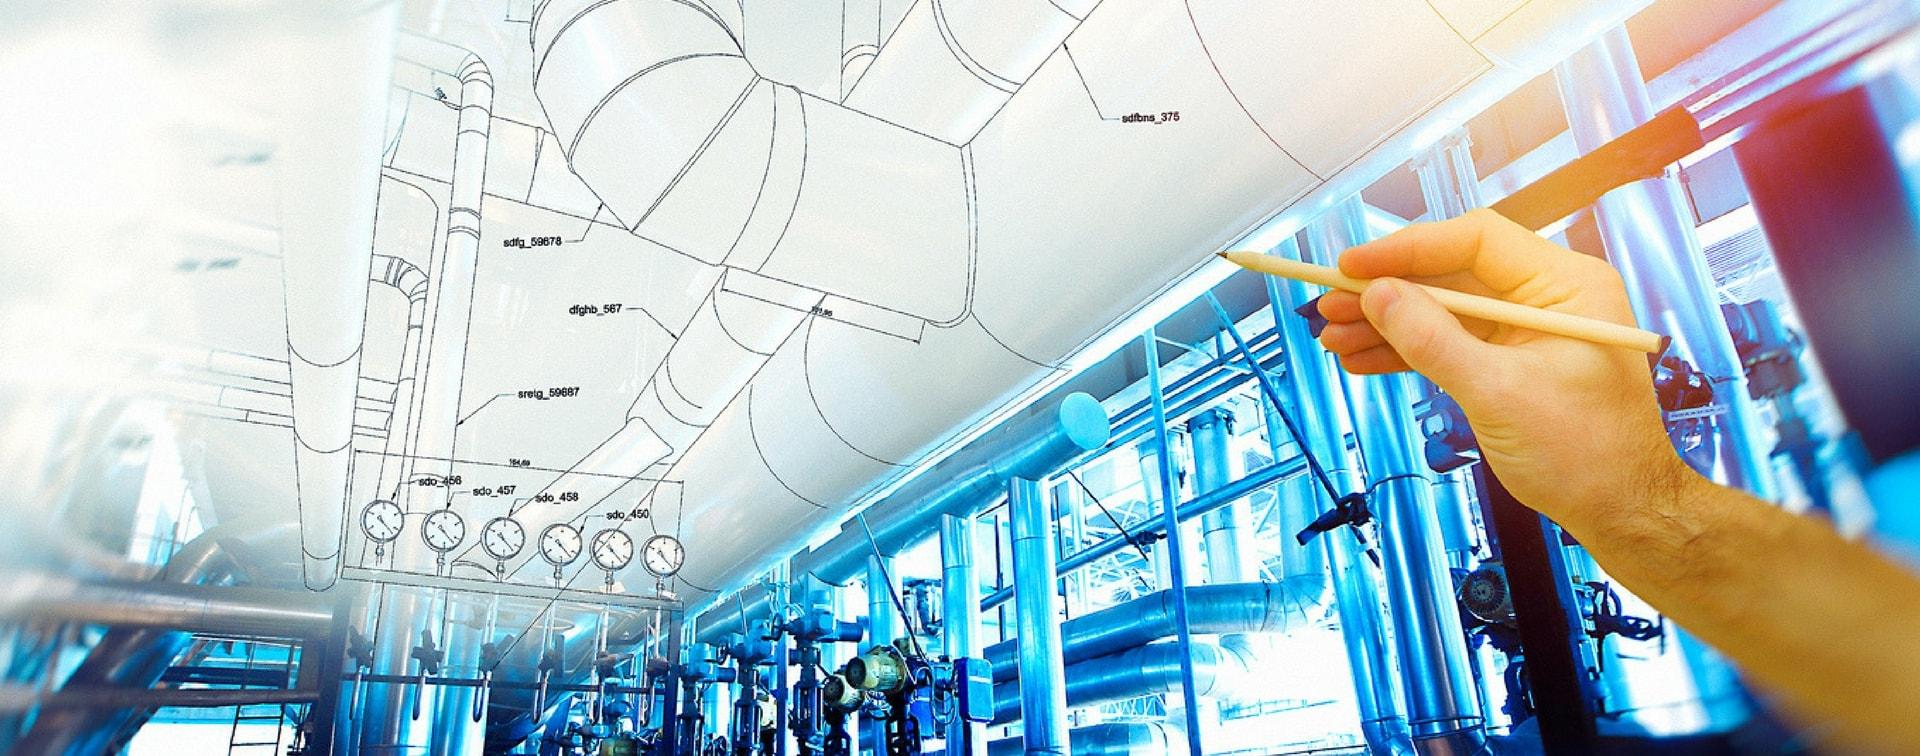 Blog Subpage 1 - manufacturing plant simulation...